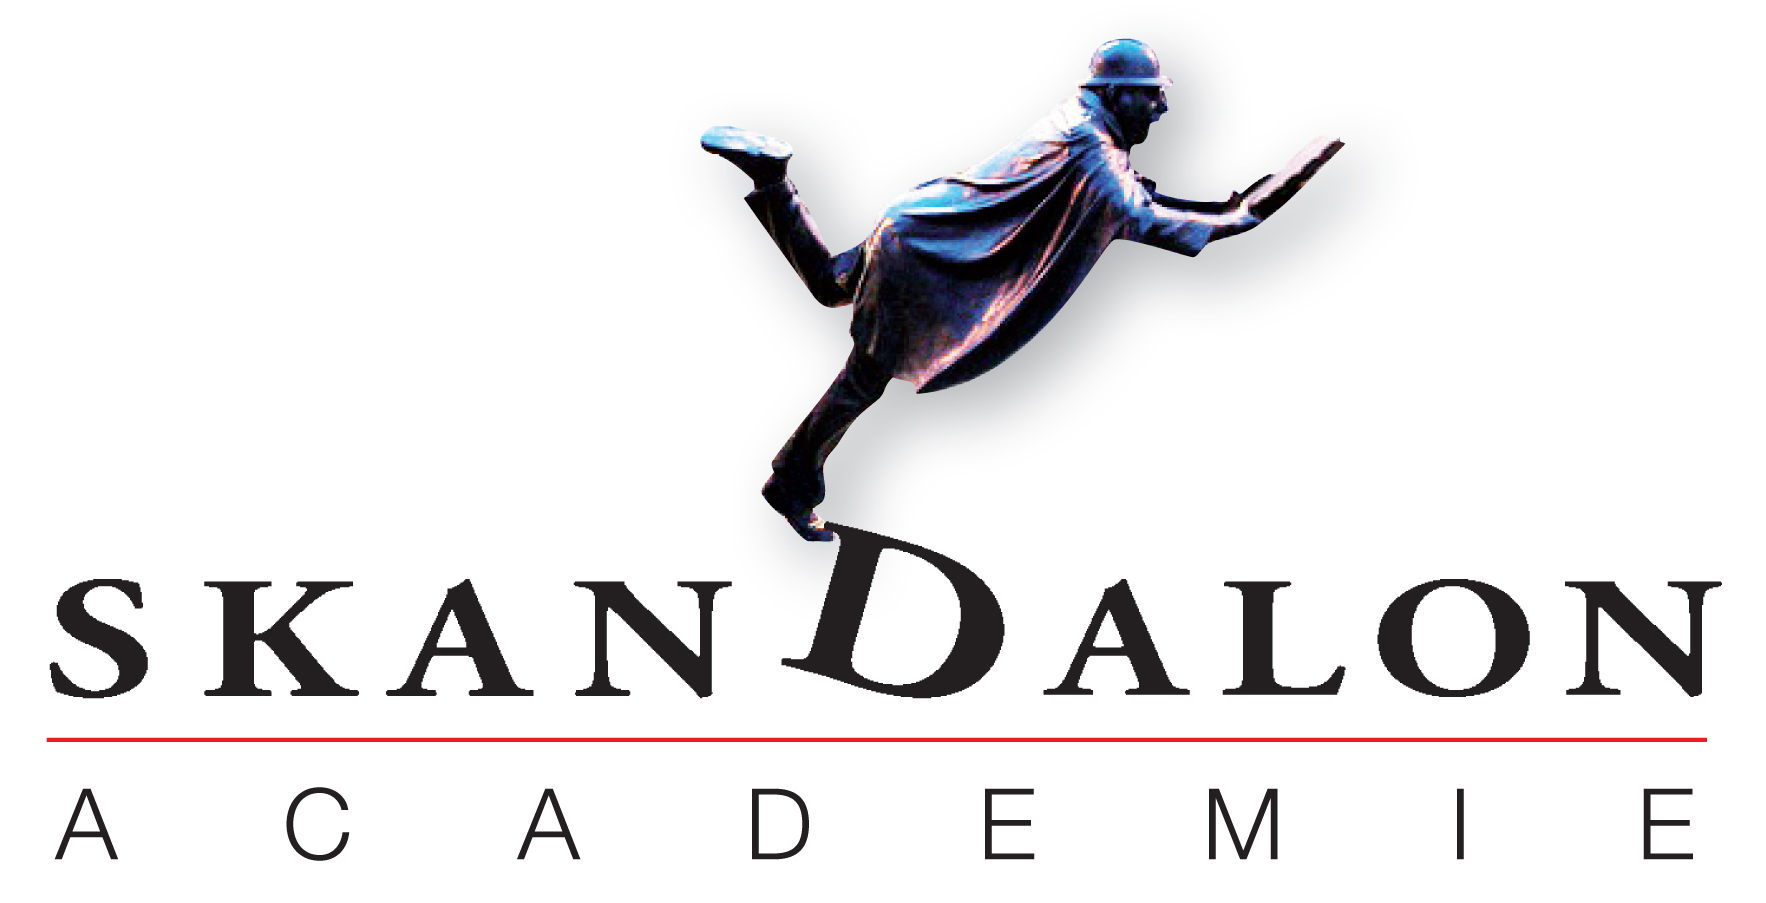 Skandalon Academie